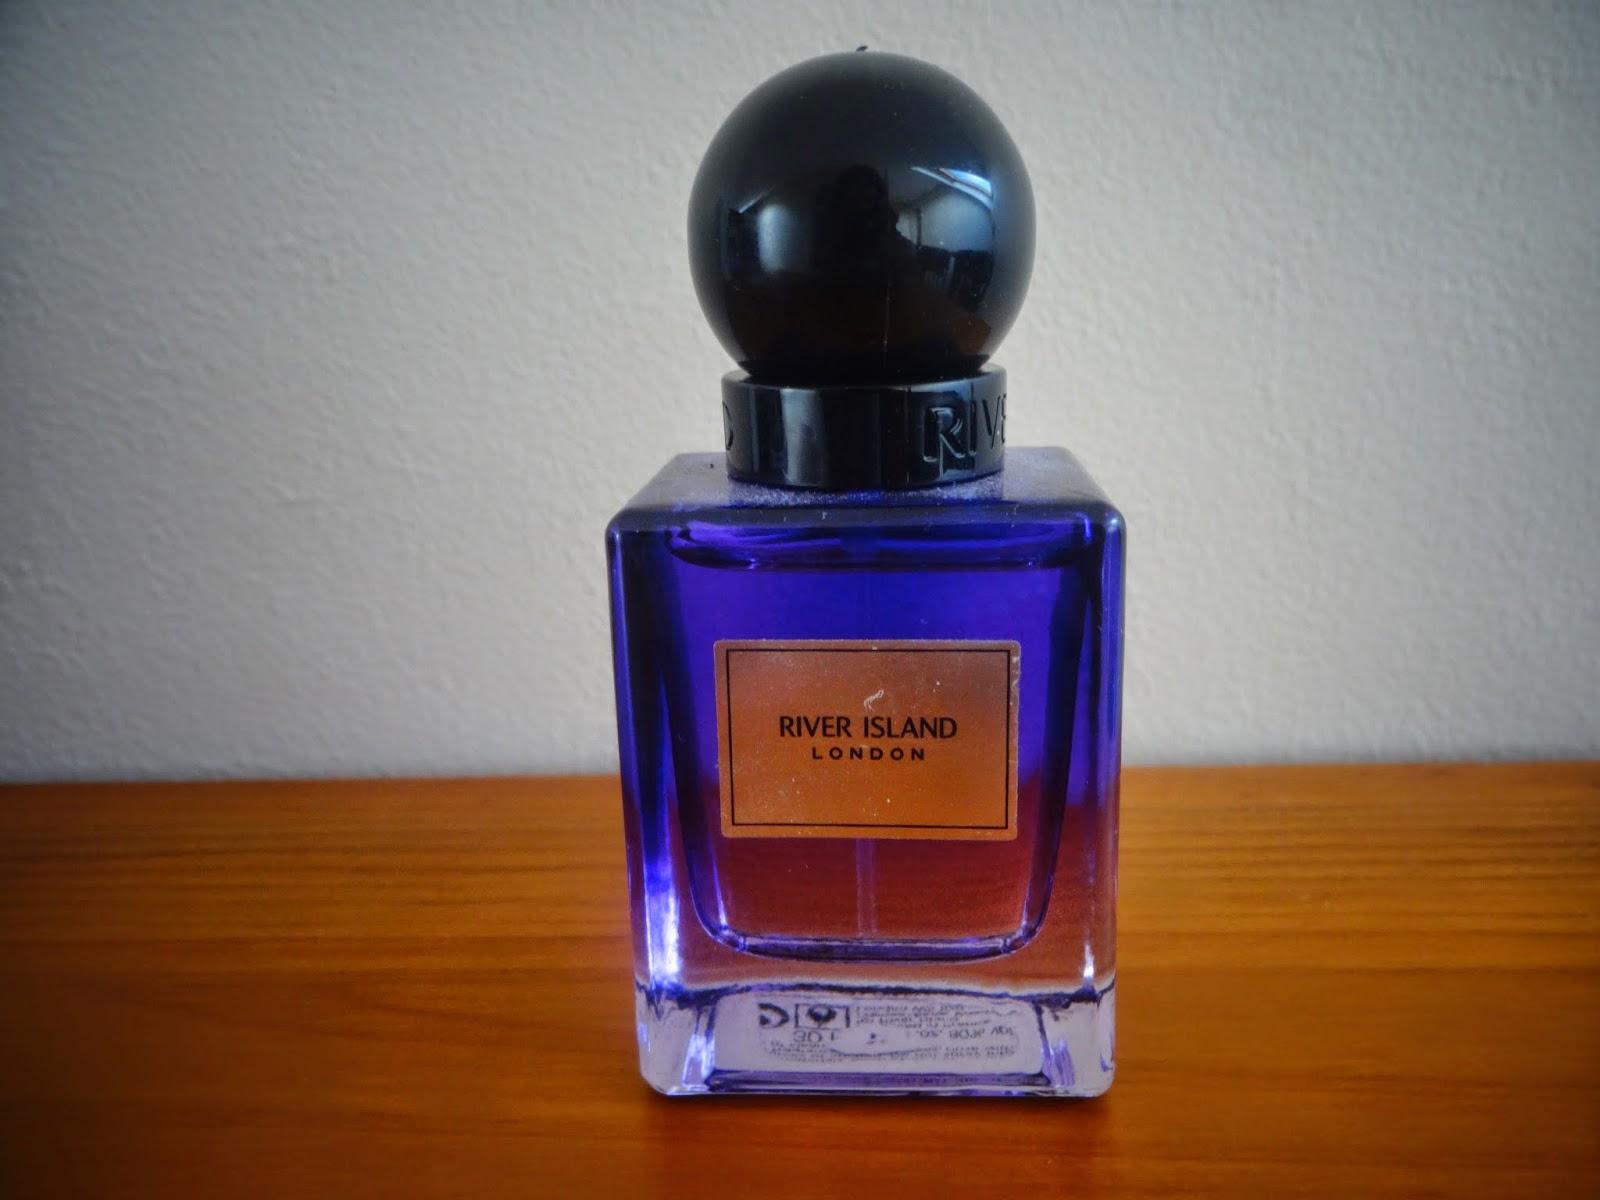 River Island London Perfume Review